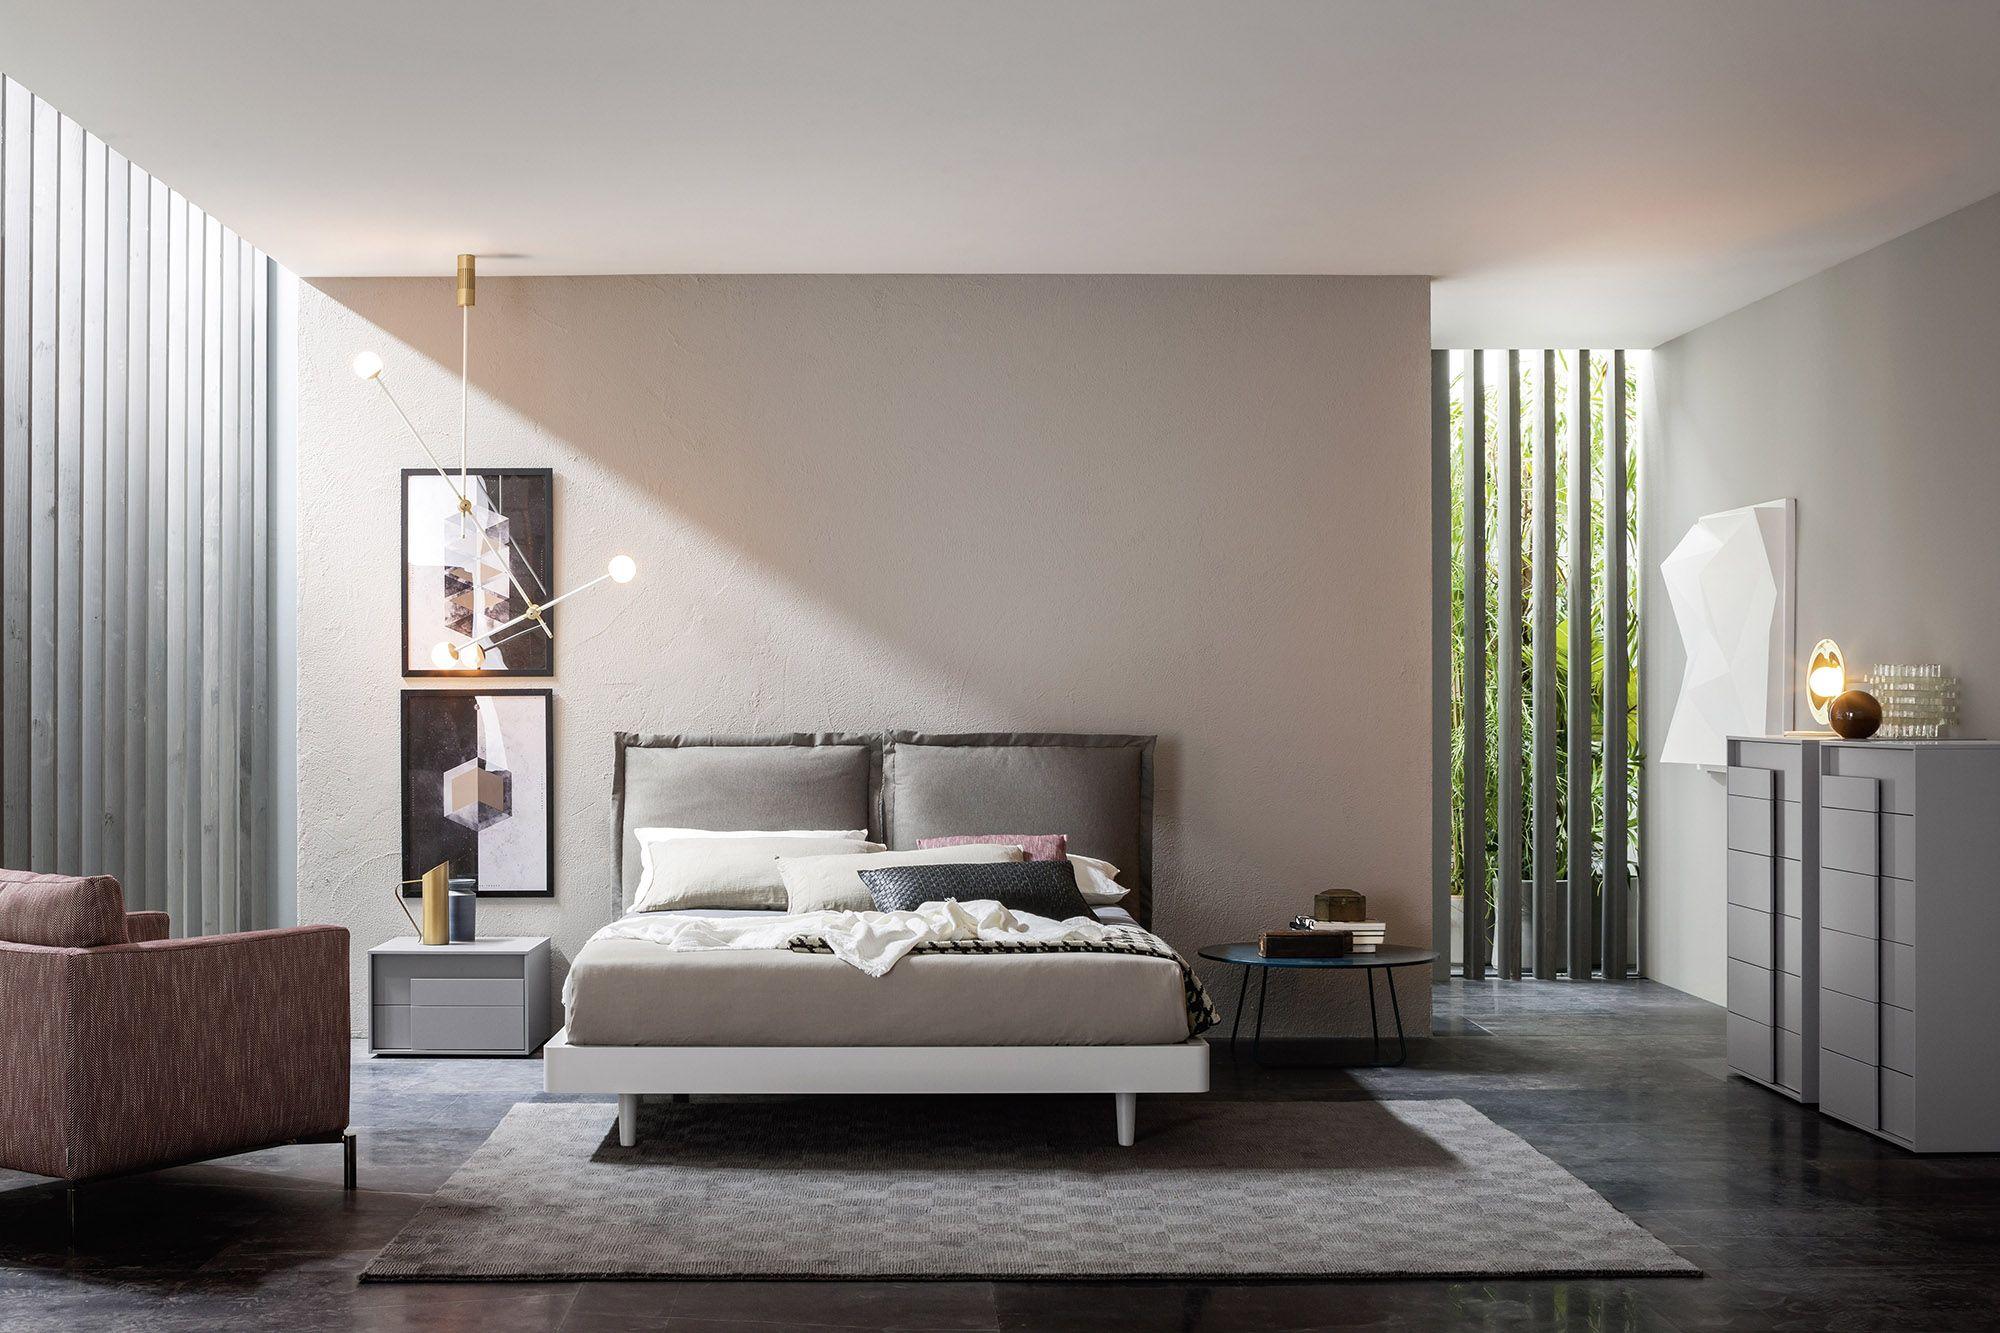 Betten | Polsterbett, Bett und Italien